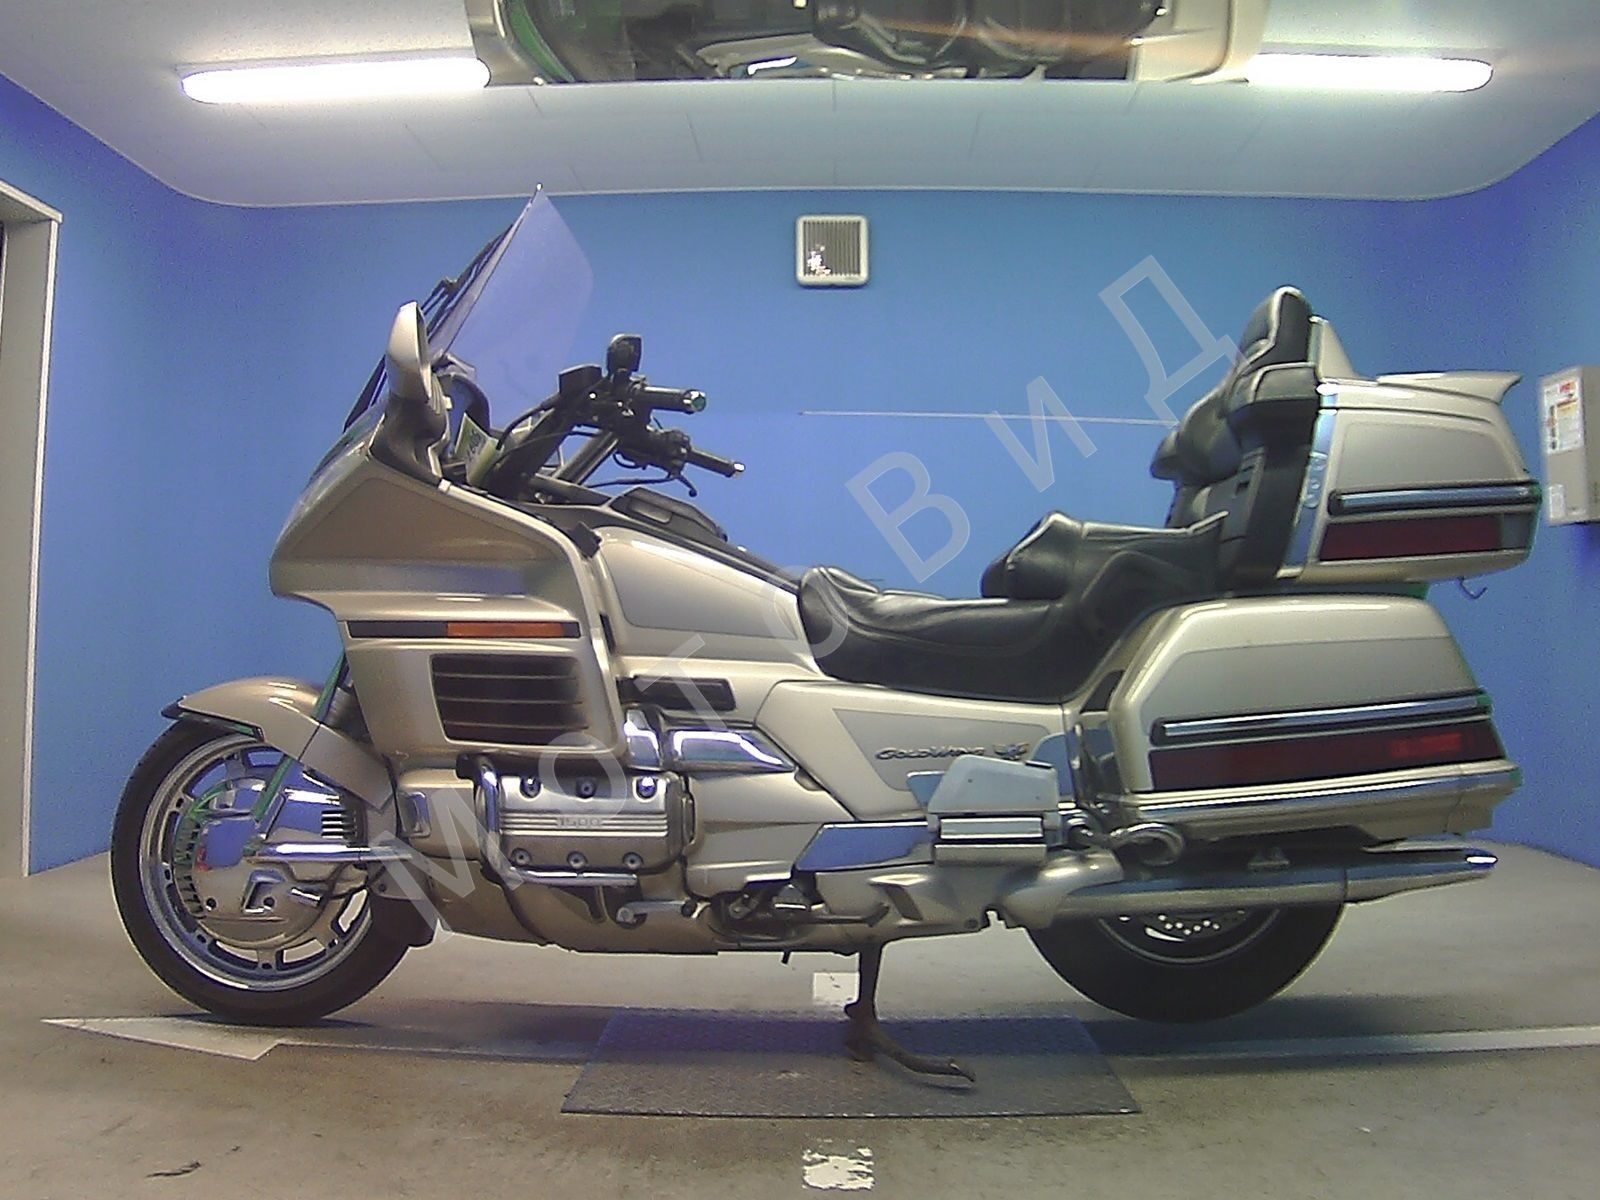 Honda GL 1500 Gold Wing / Обзор мототехники секонд хенд